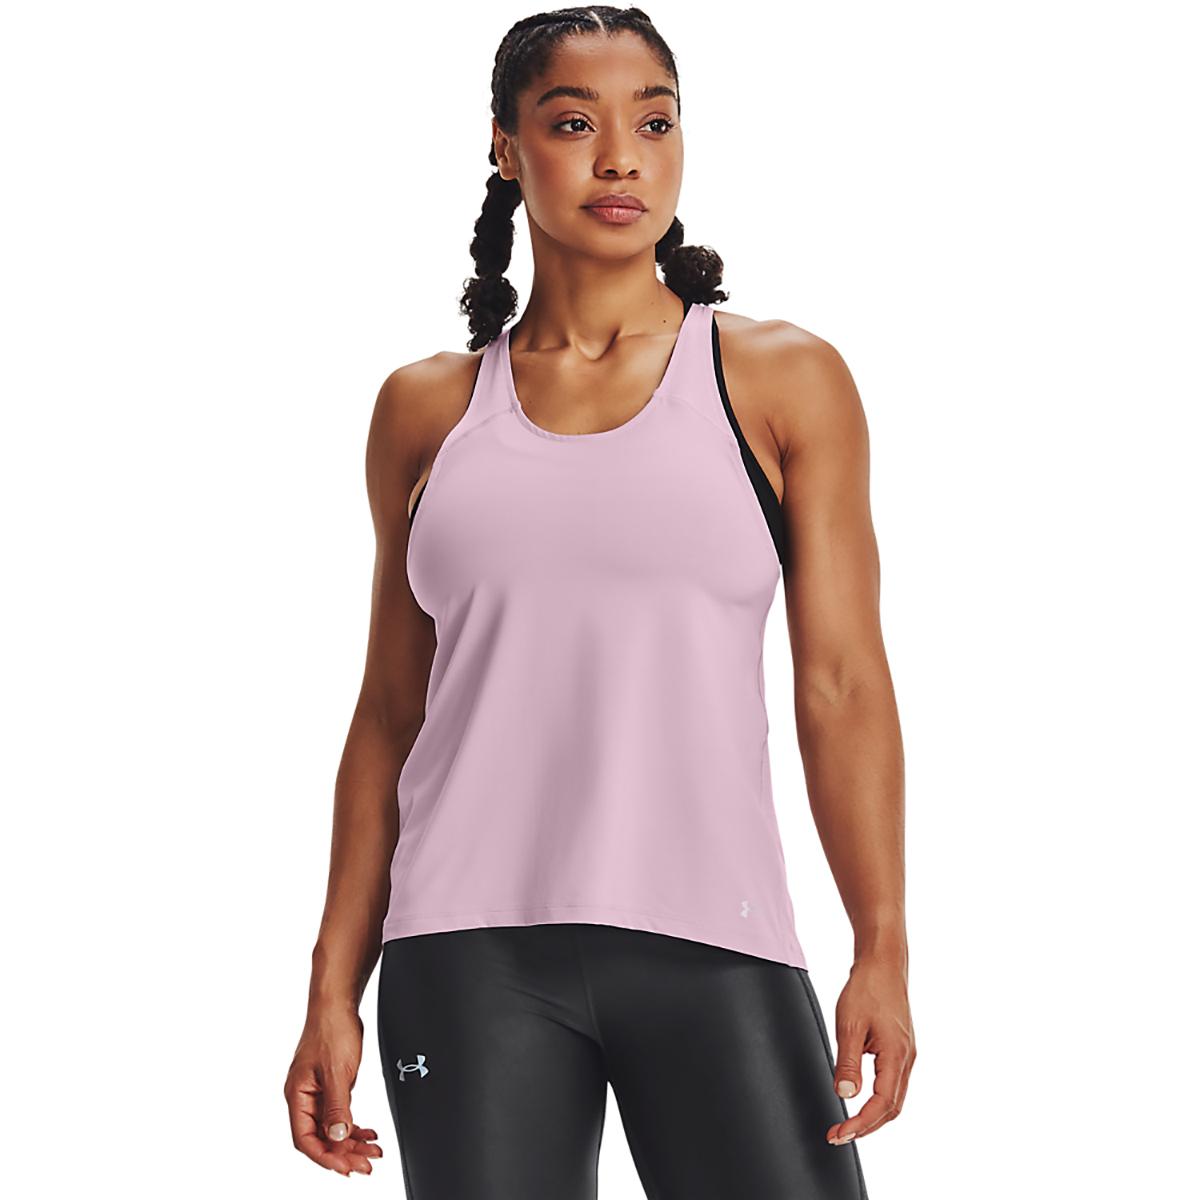 Women's Under Armour Iso-Chill Run 200 Tank - Color: Mauve Pink/Mauve Pink/Reflective - Size: XS, Mauve Pink/Mauve Pink/Reflective, large, image 1